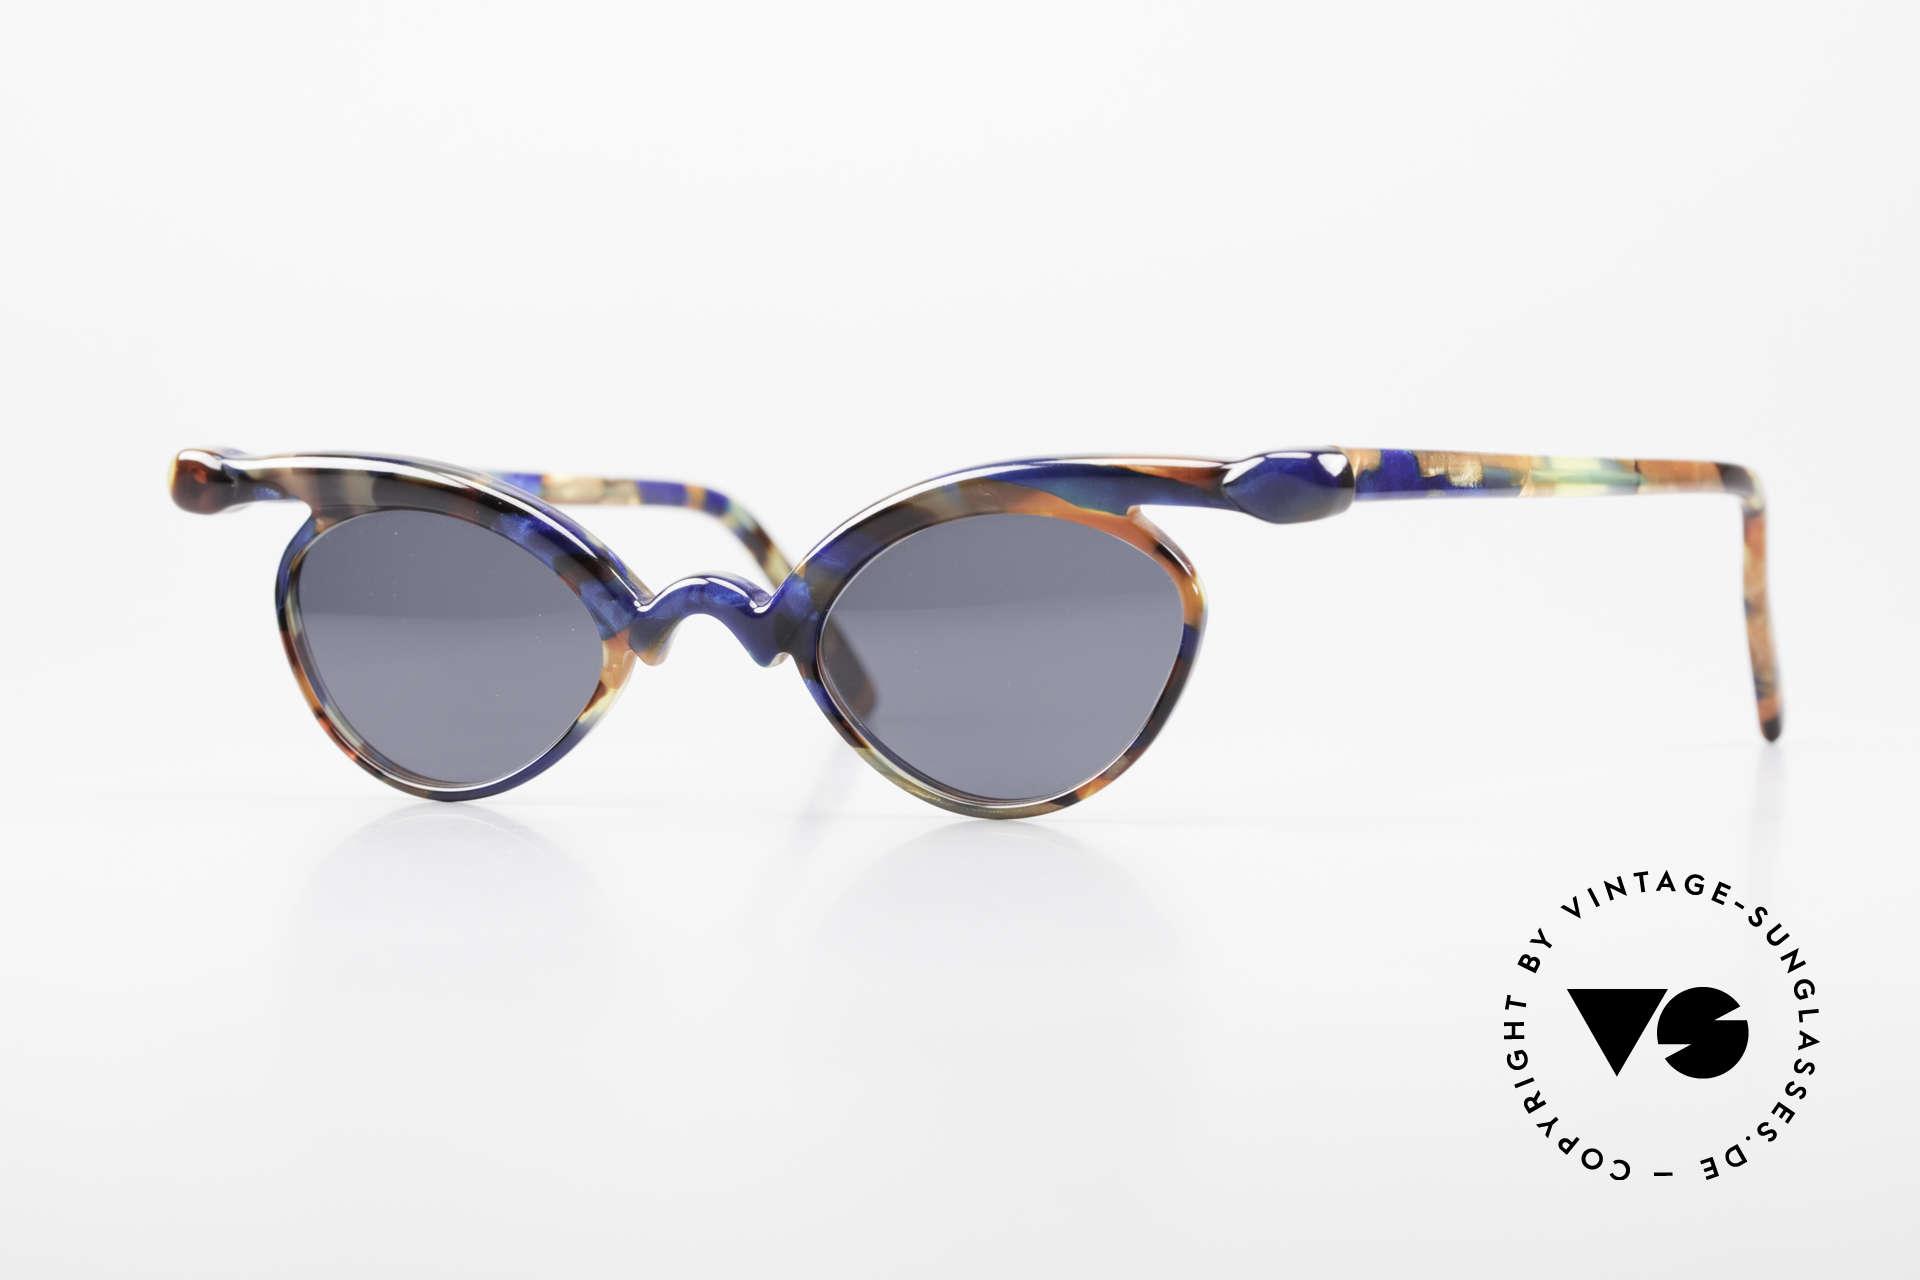 Design Maske Berlin Niobe Artful 90's Ladies Sunglasses, Design Maske Berlin: glasses like never seen before, Made for Women